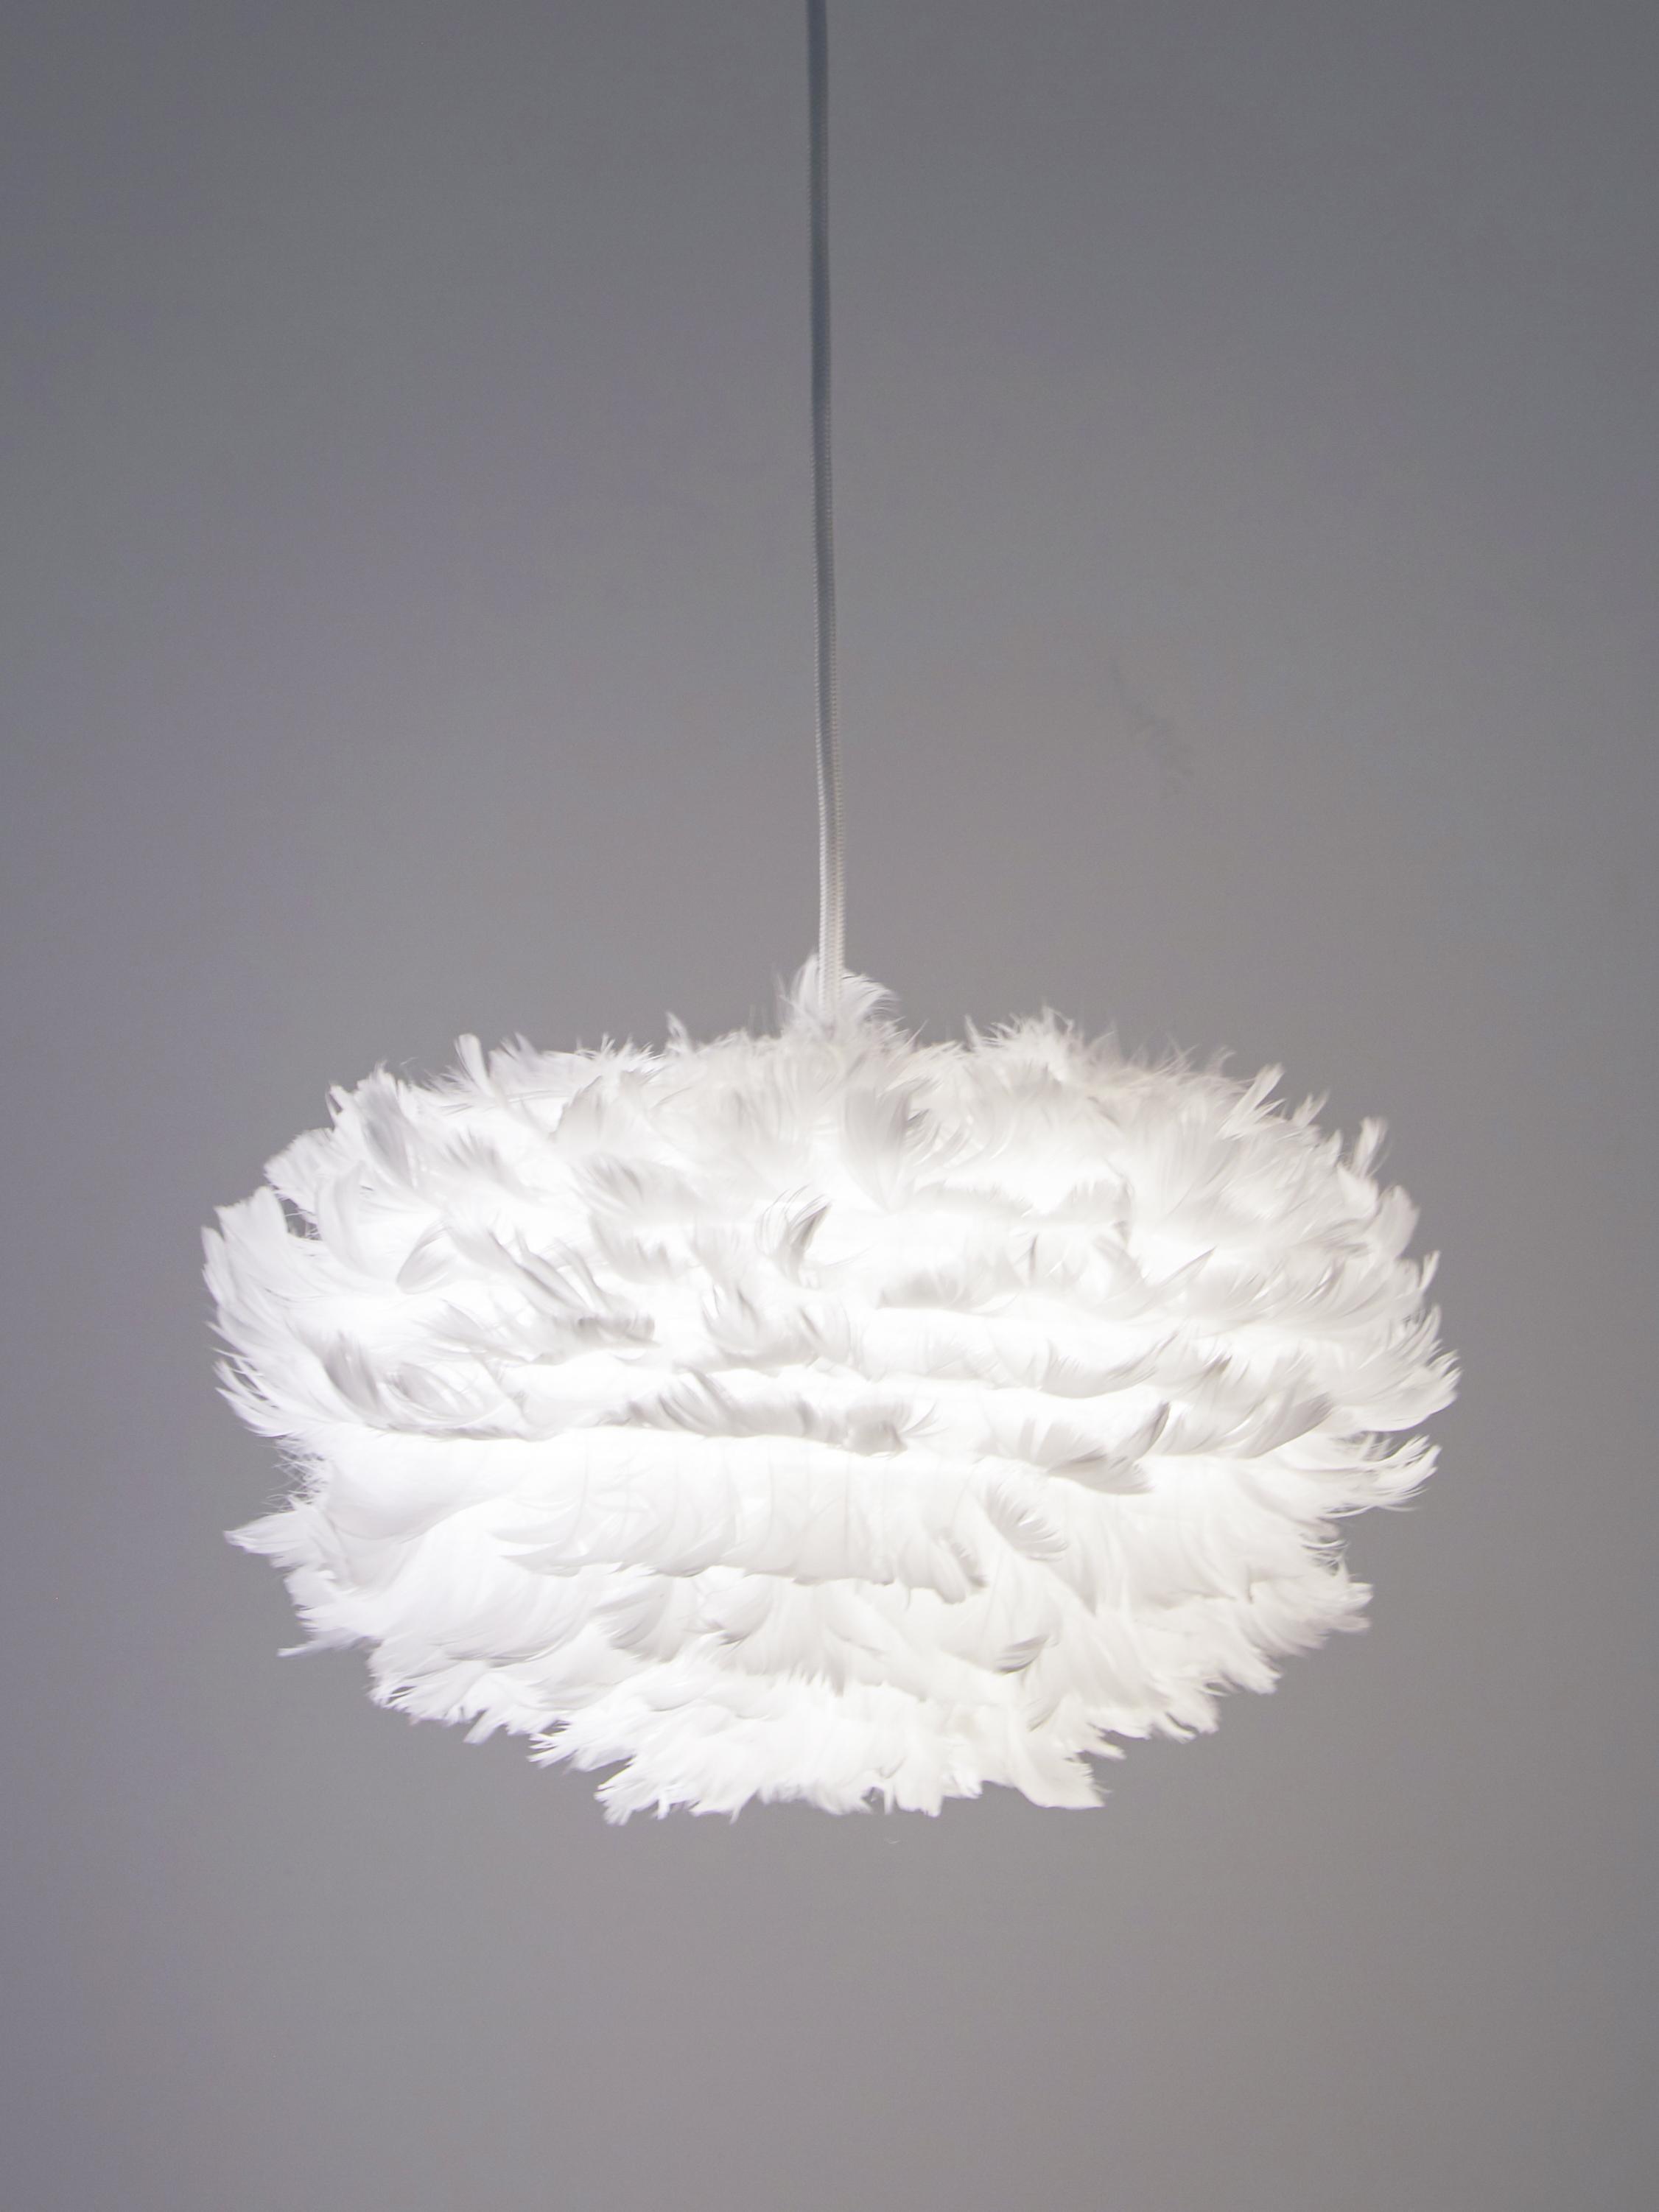 Lampada a sospensione in piume Eos, Paralume: piuma d'oca, acciaio, Baldacchino: materiale sintetico, Bianco, Ø 65 x Alt. 40 cm